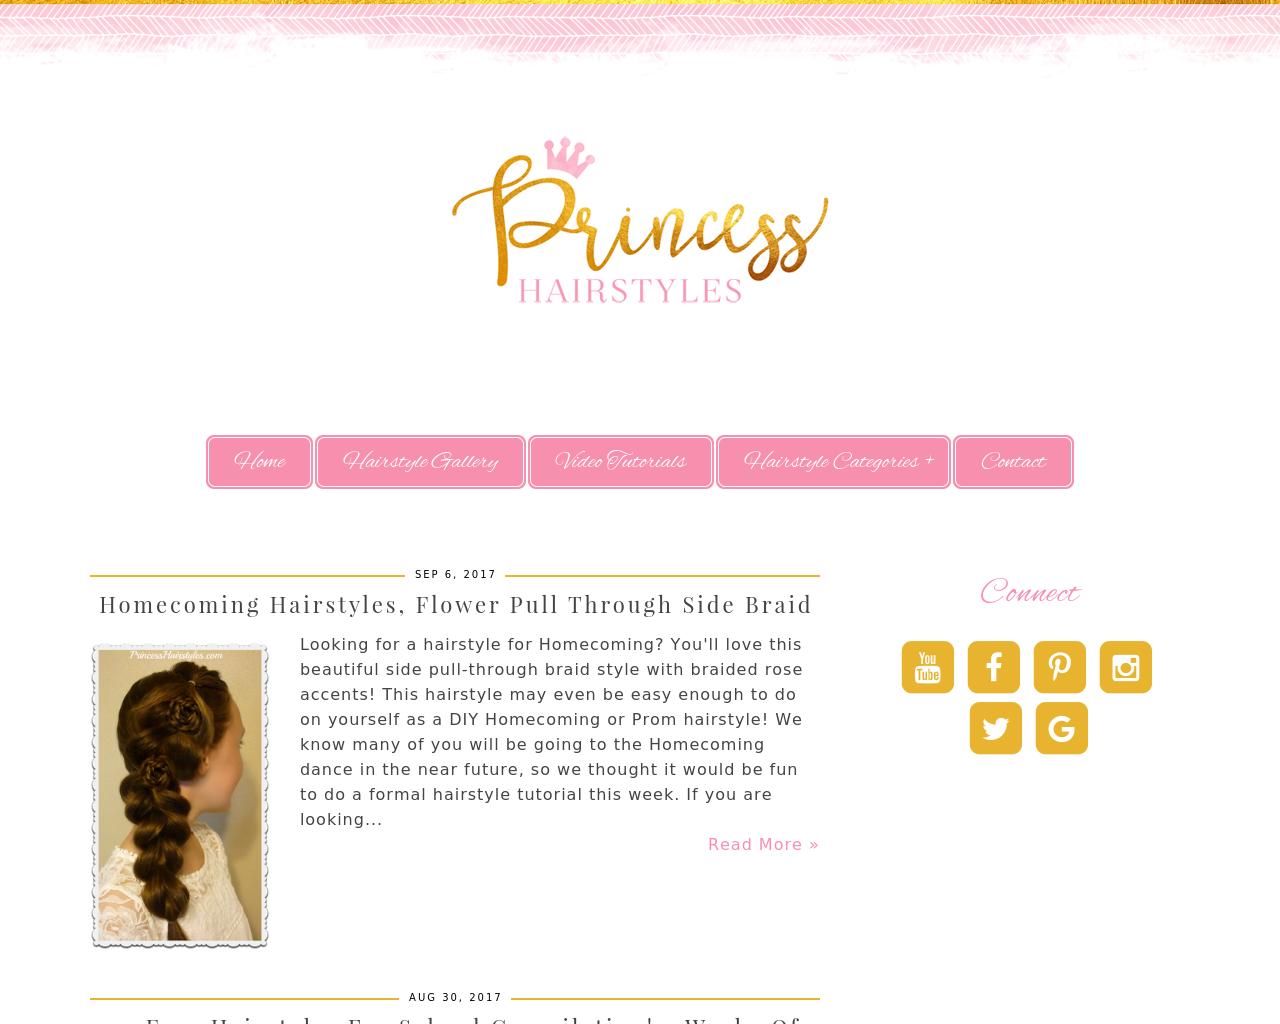 Princesshairstyles-Advertising-Reviews-Pricing